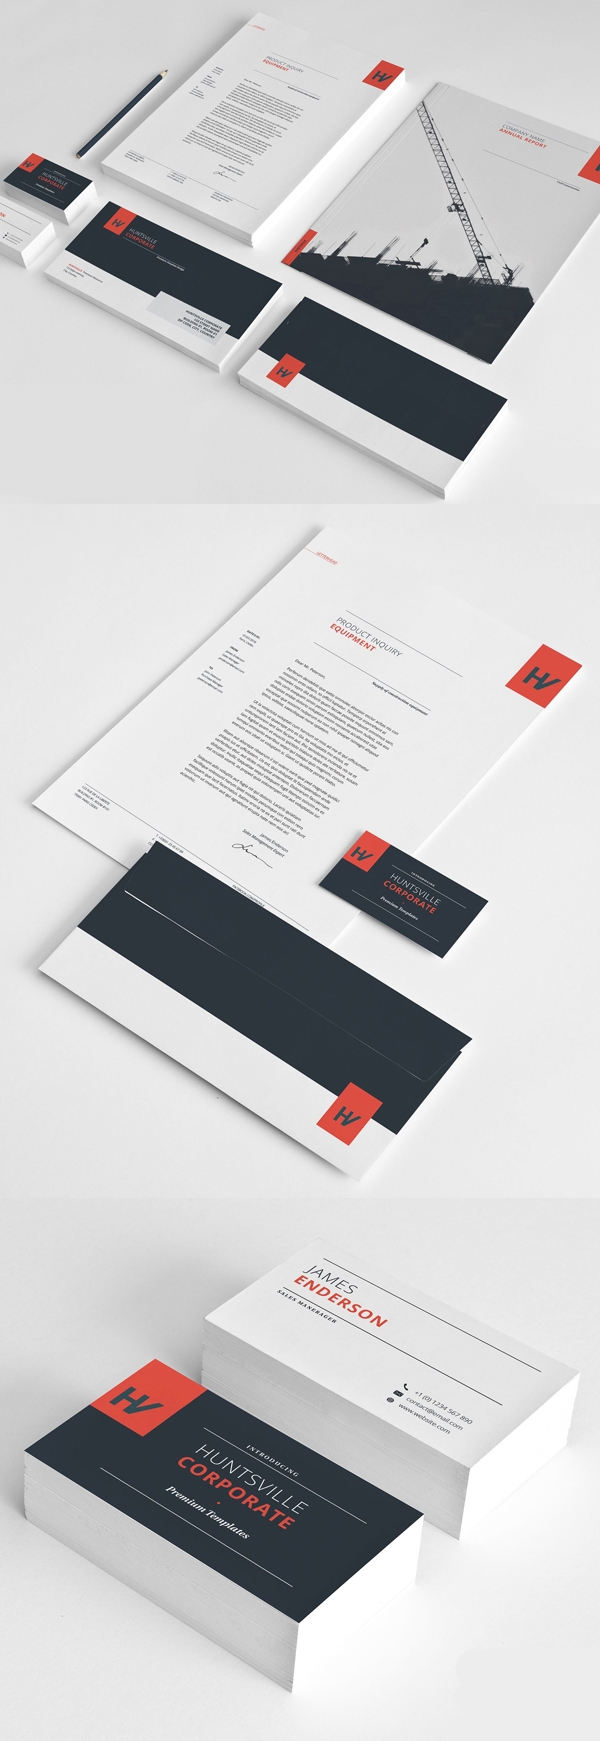 Modern Business Branding / Stationery Templates Design - 1